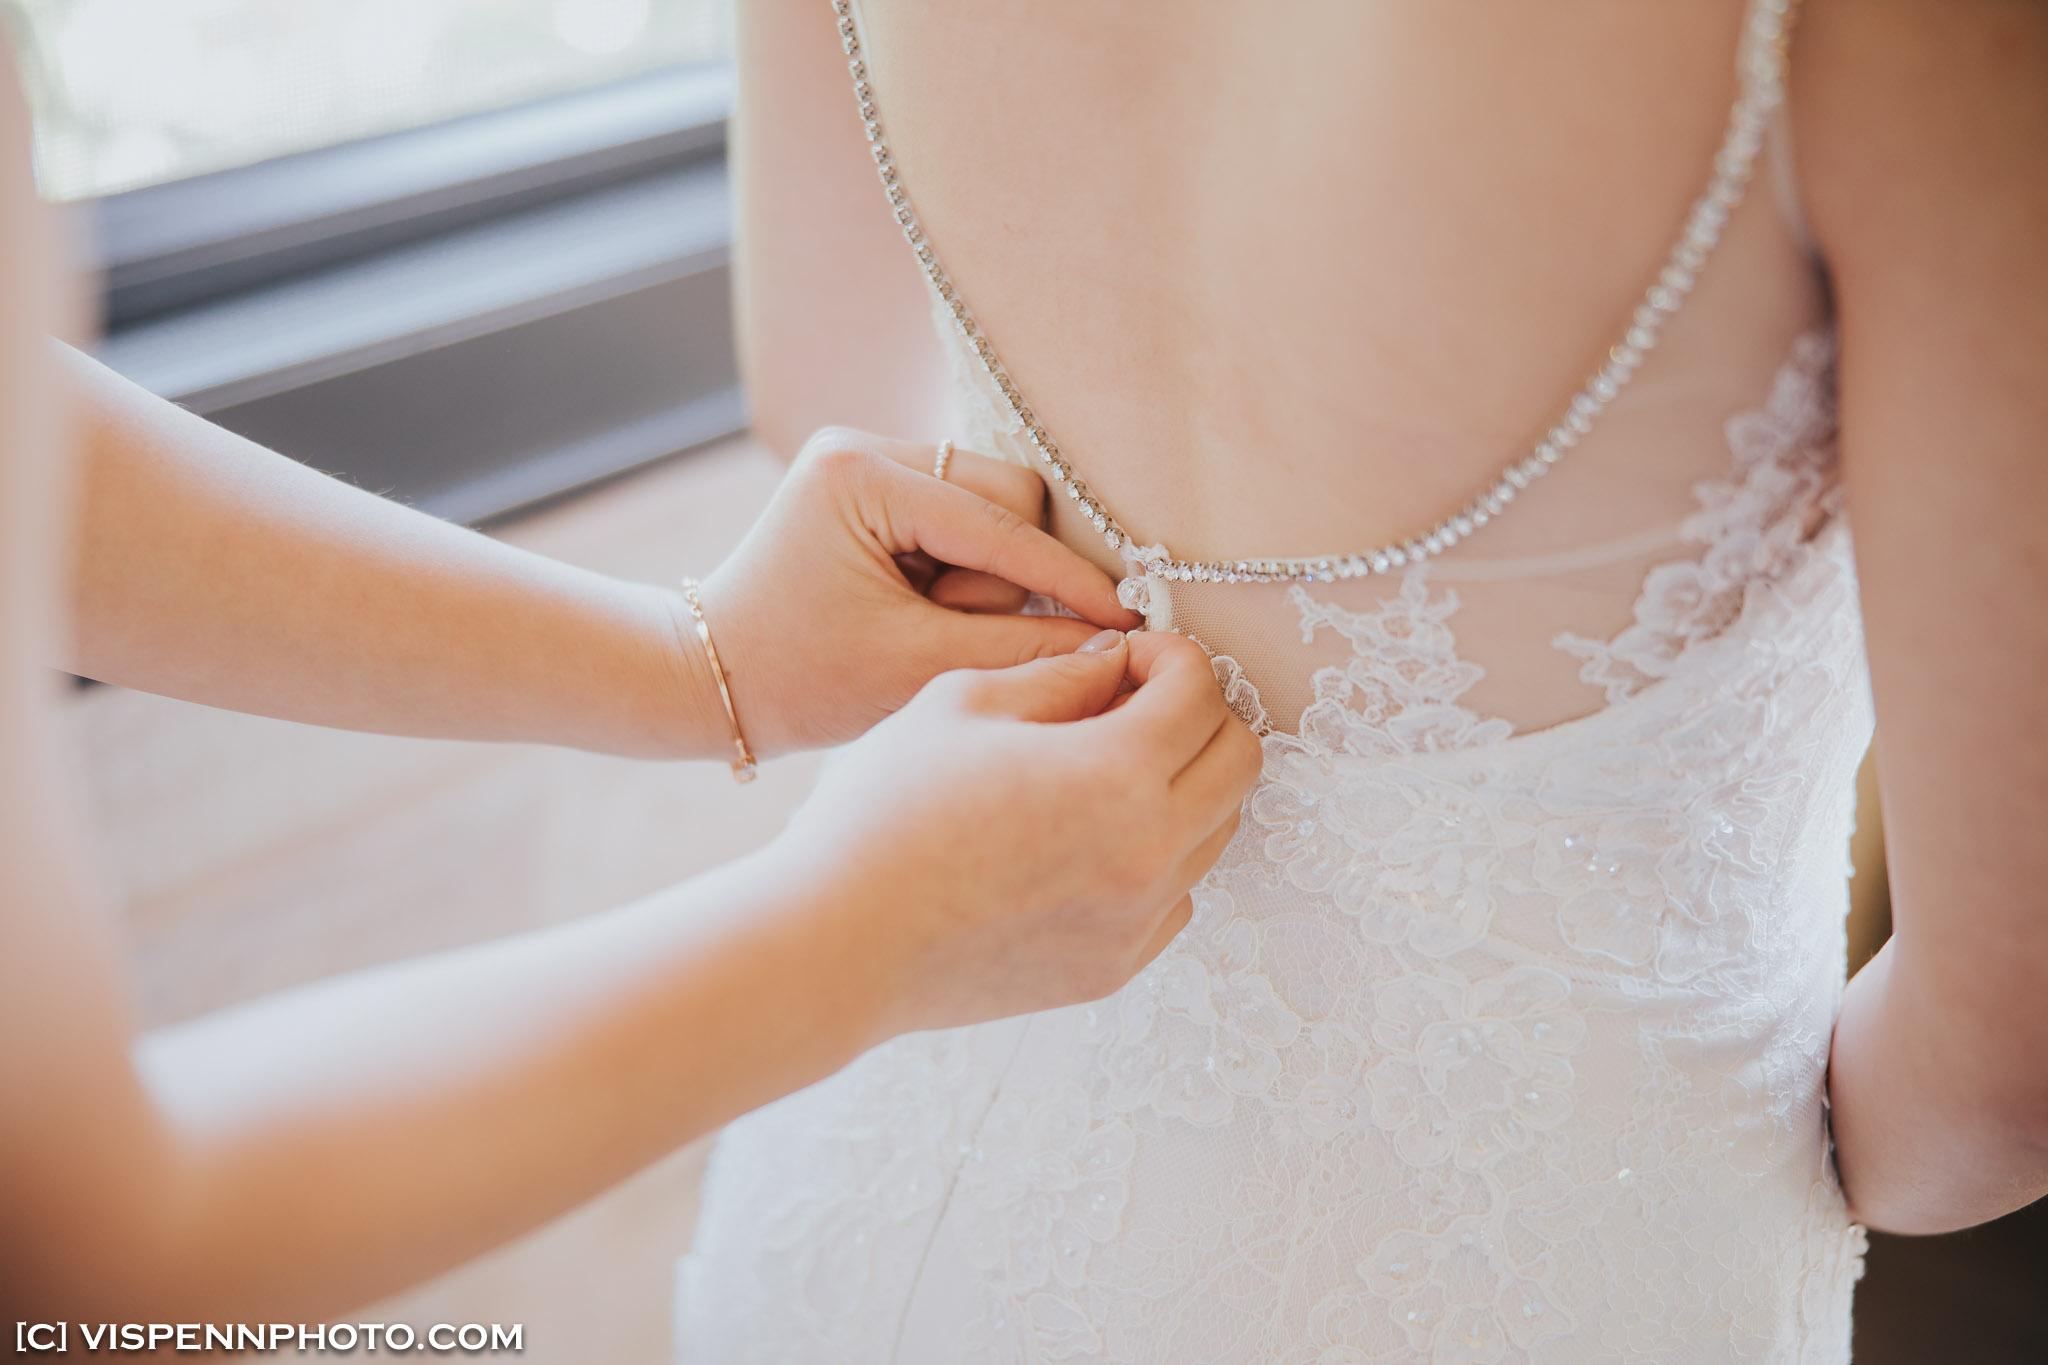 WEDDING DAY Photography Melbourne VISPENN 墨尔本 婚礼跟拍 婚礼摄像 婚礼摄影 结婚照 登记照 ElitaPB 04891 1P EOSR VISPENN